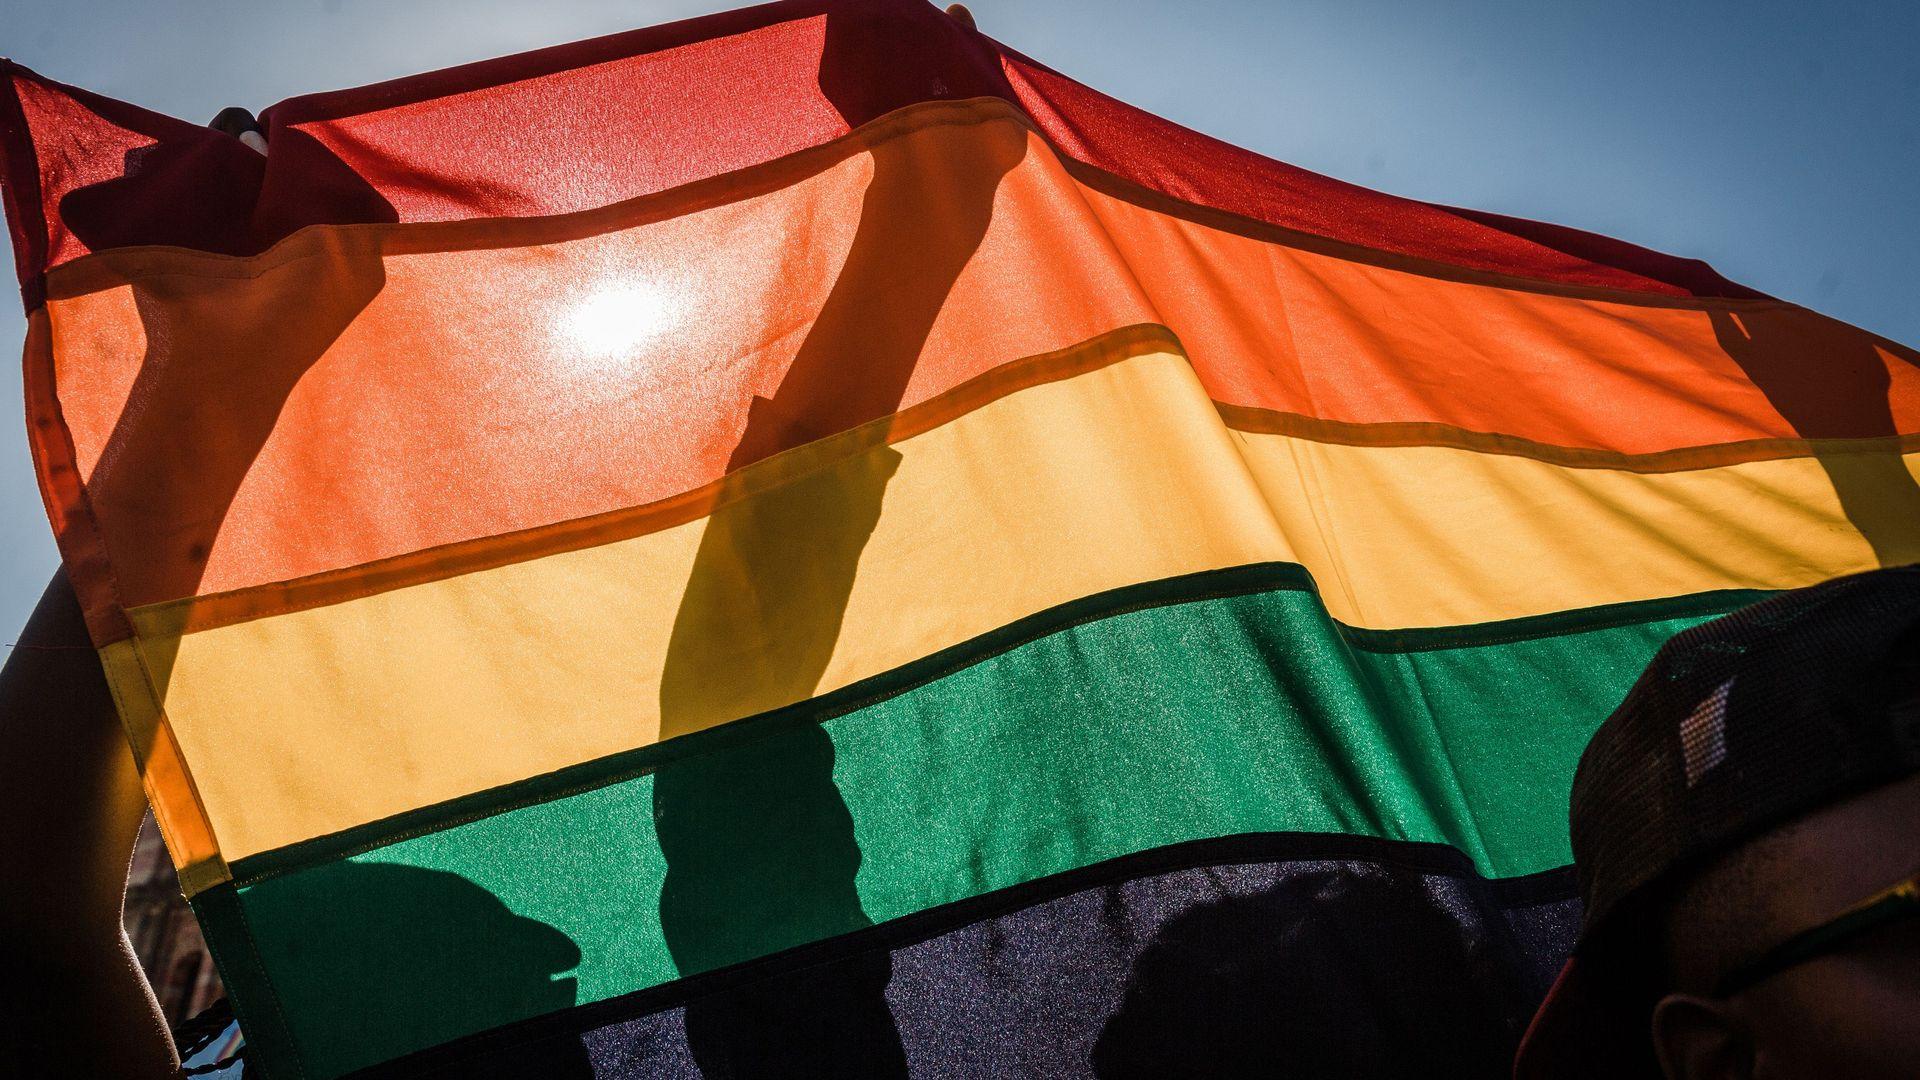 Gay pride flag. Photo: RAJESH JANTILAL/AFP/Getty Images